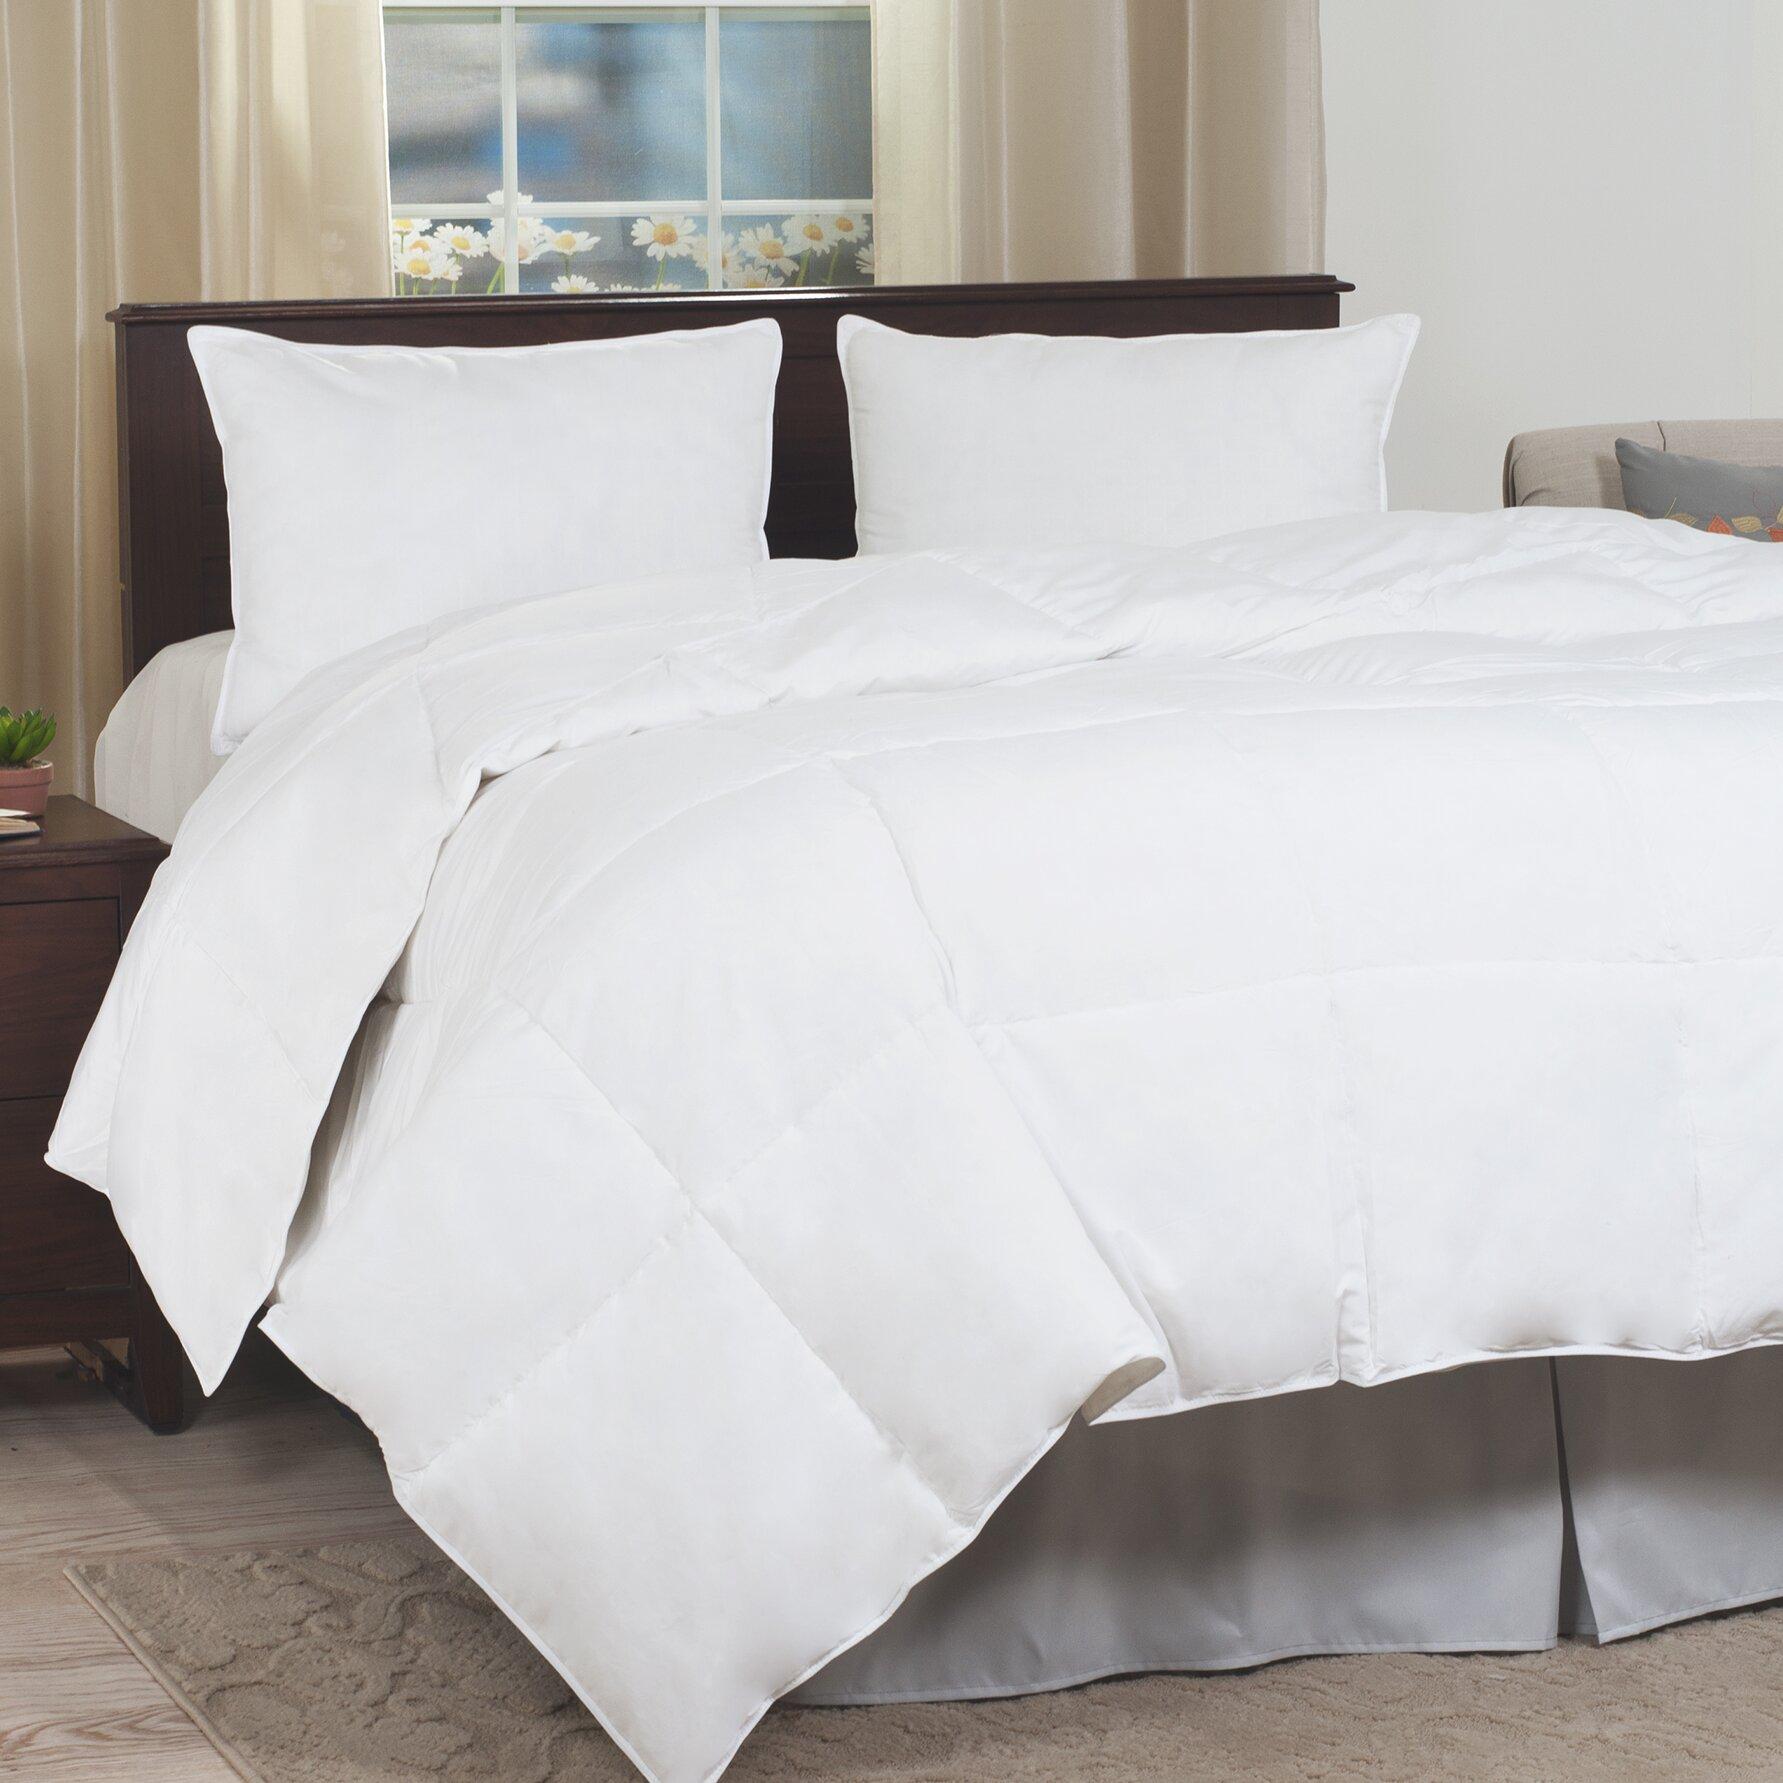 Lavish Home Ultra Soft Down Alternative Bedding Comforter